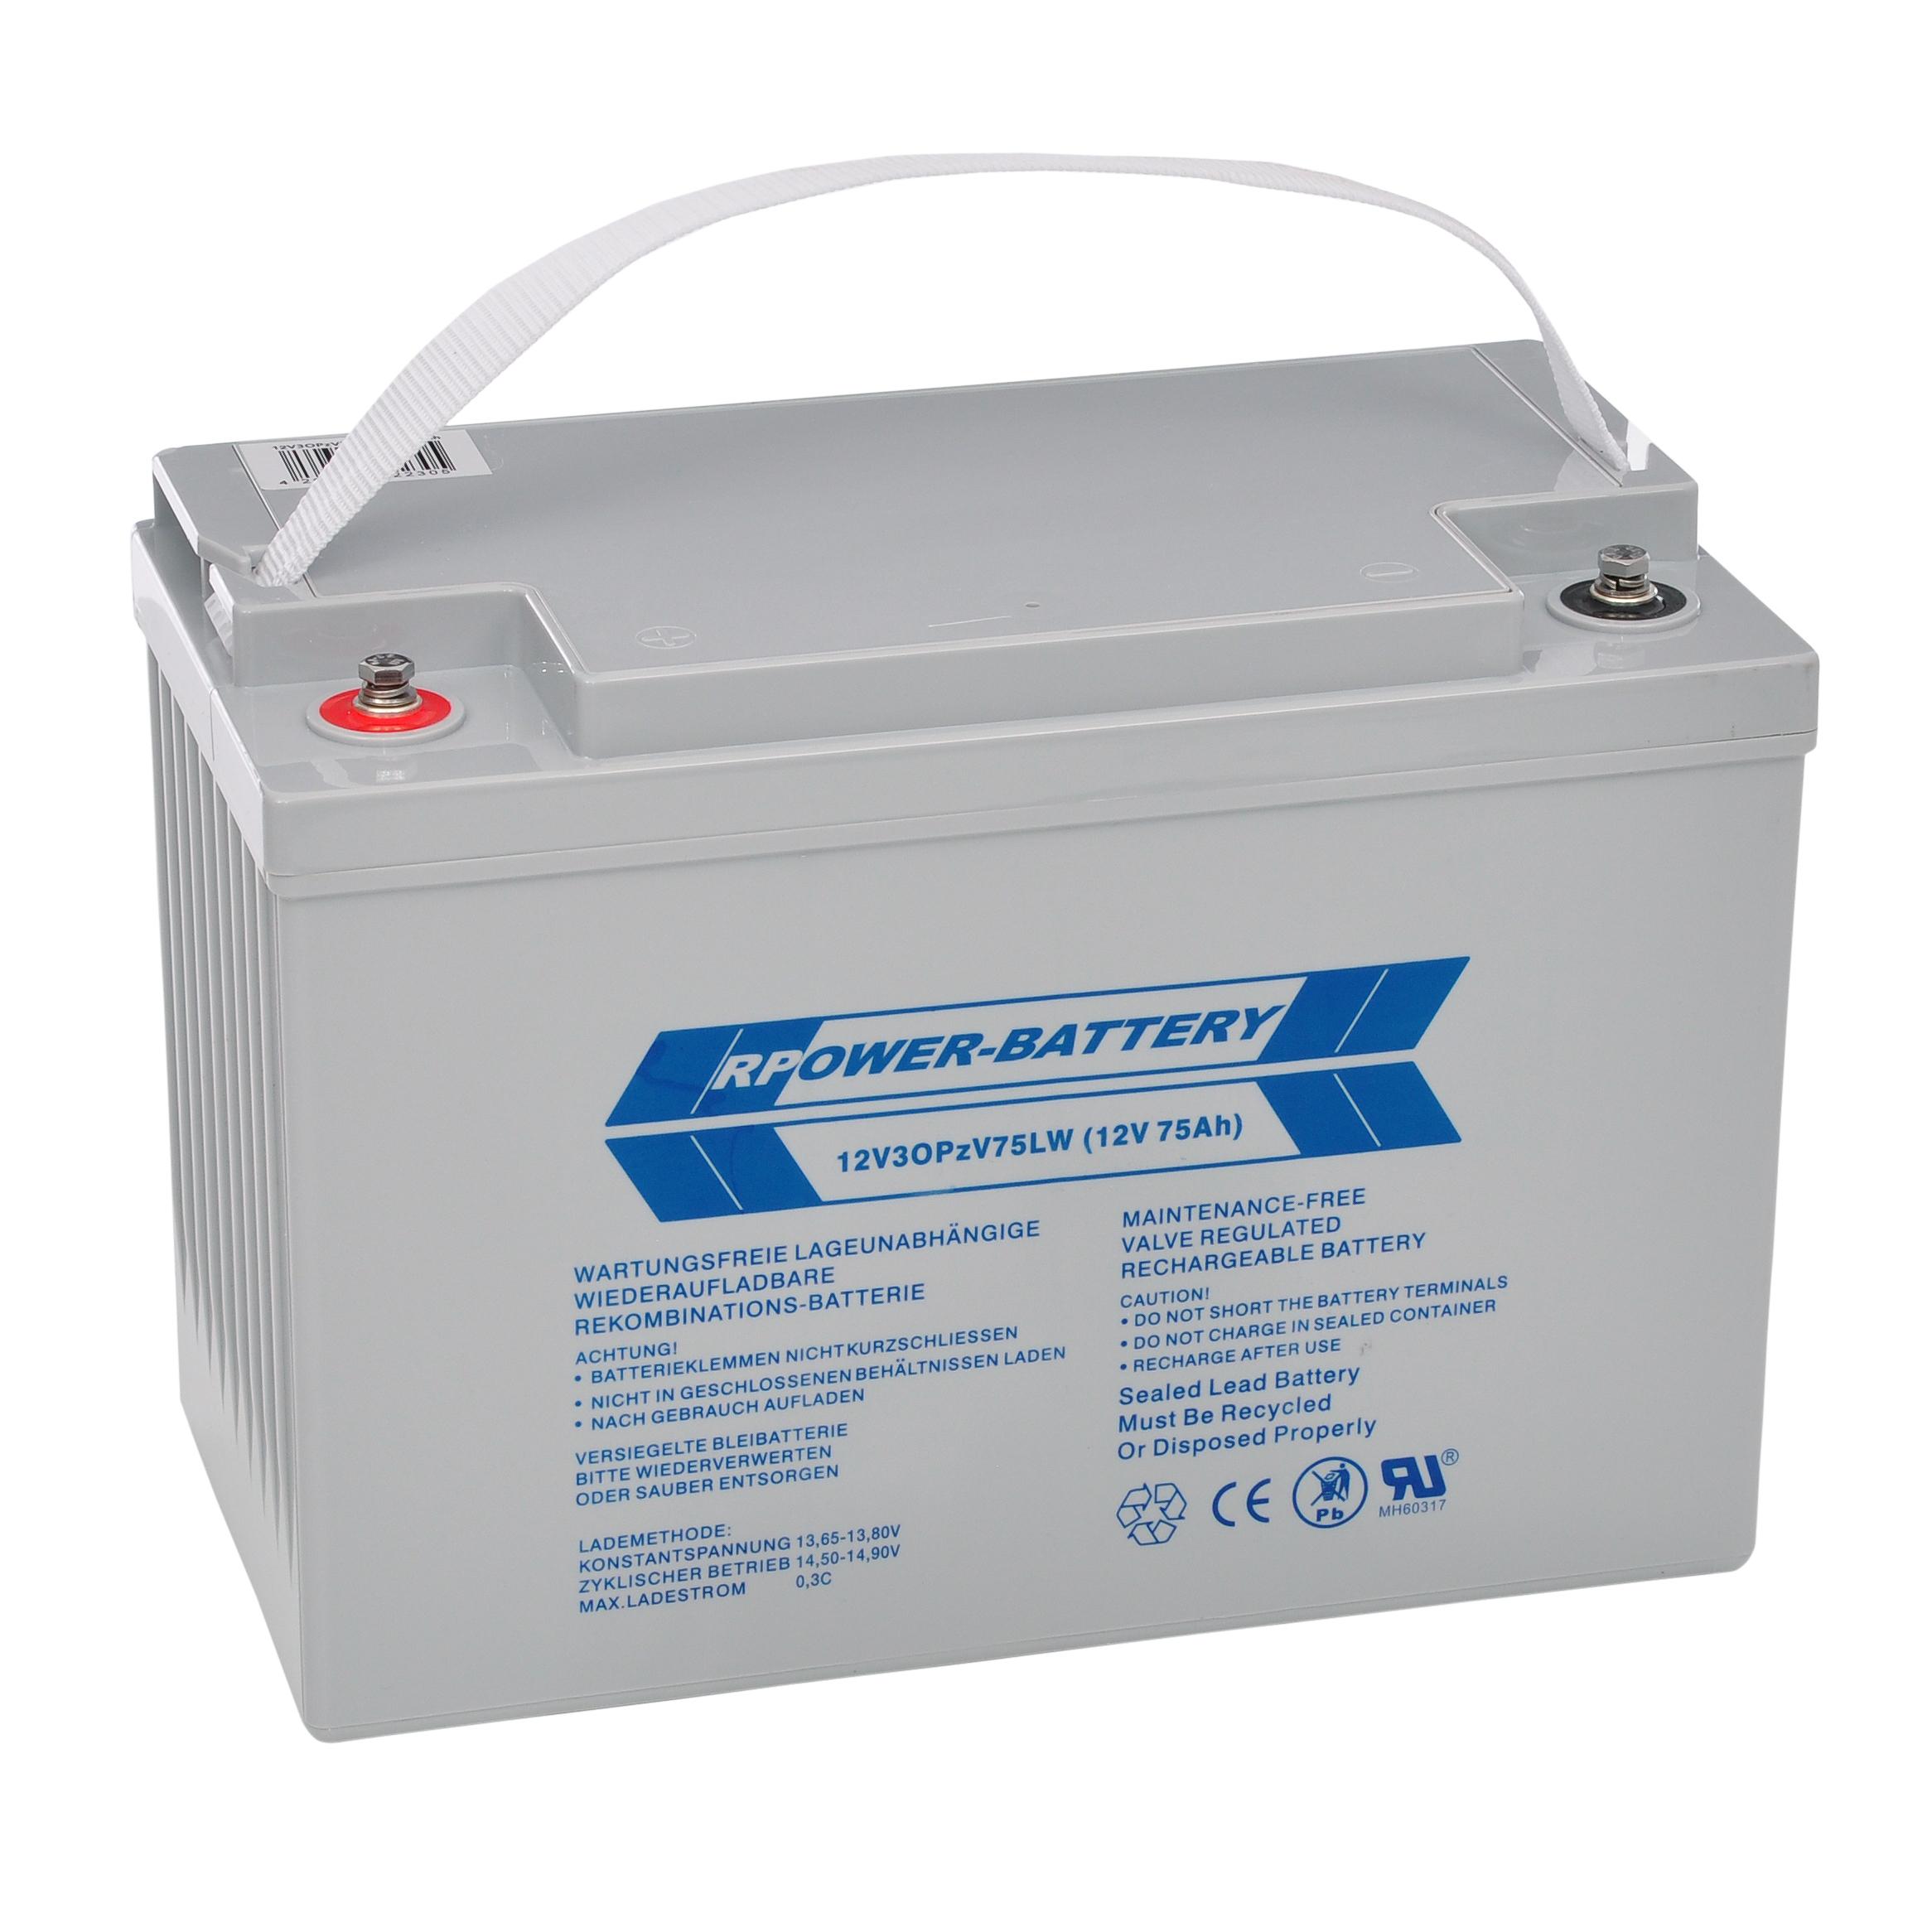 Batteriesatz 216V 18 Stk, longlife OPzV 12V/75Ah (C10)